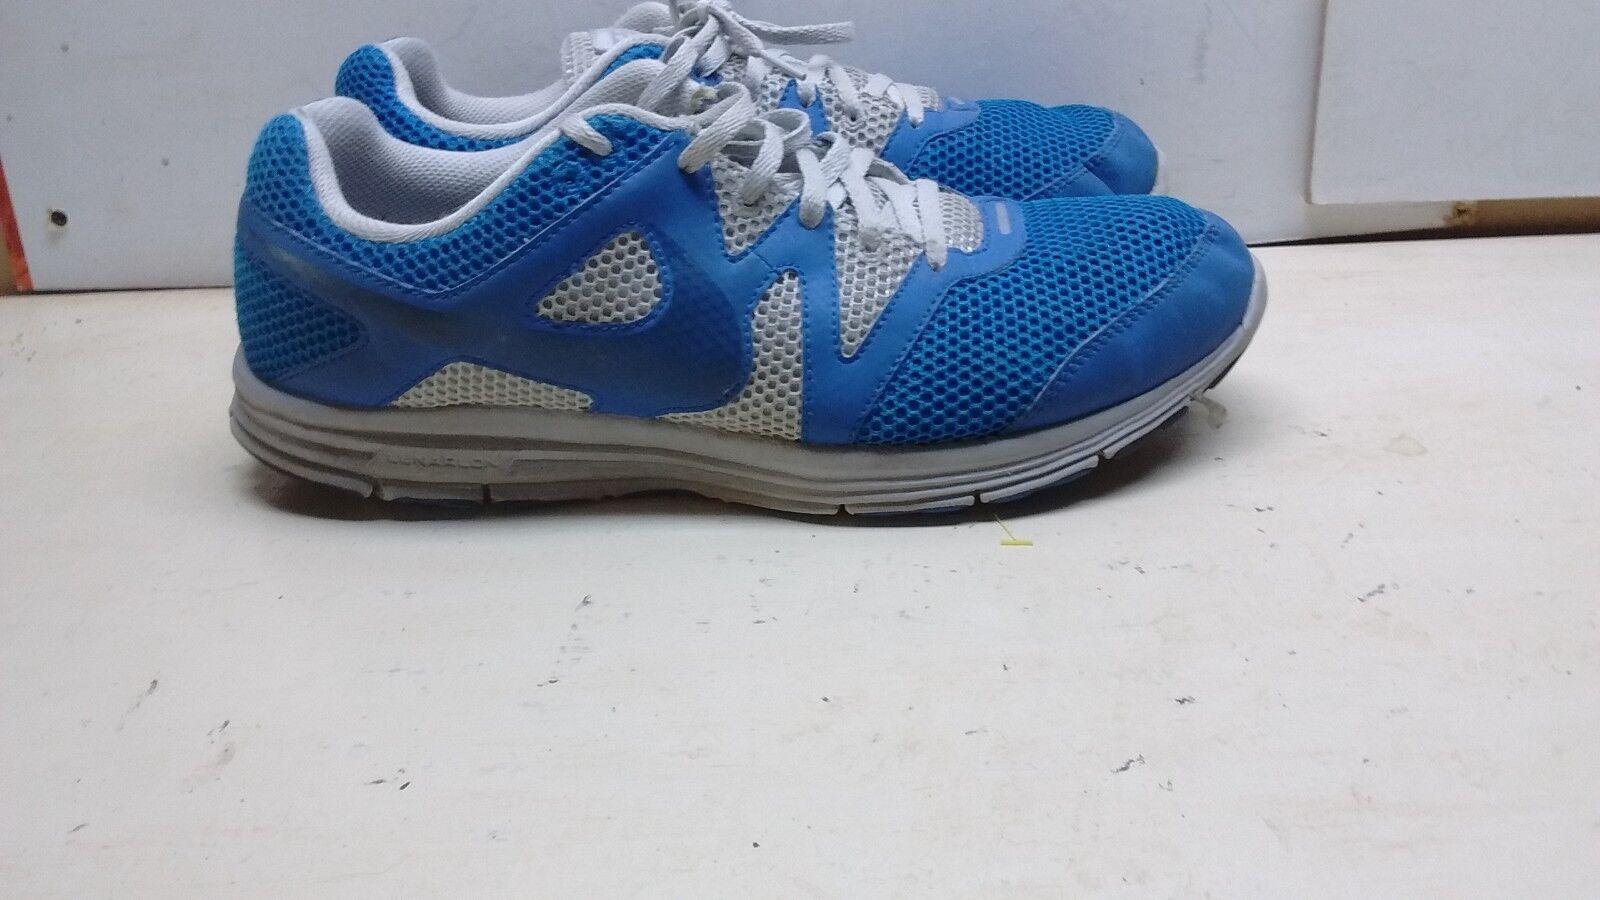 NIKE Lunar Fly Hommes 3 Hommes Fly Bleu/blanc Athletic Walking Sporting Sneaker Chaussures 12M 46 fe5ef2